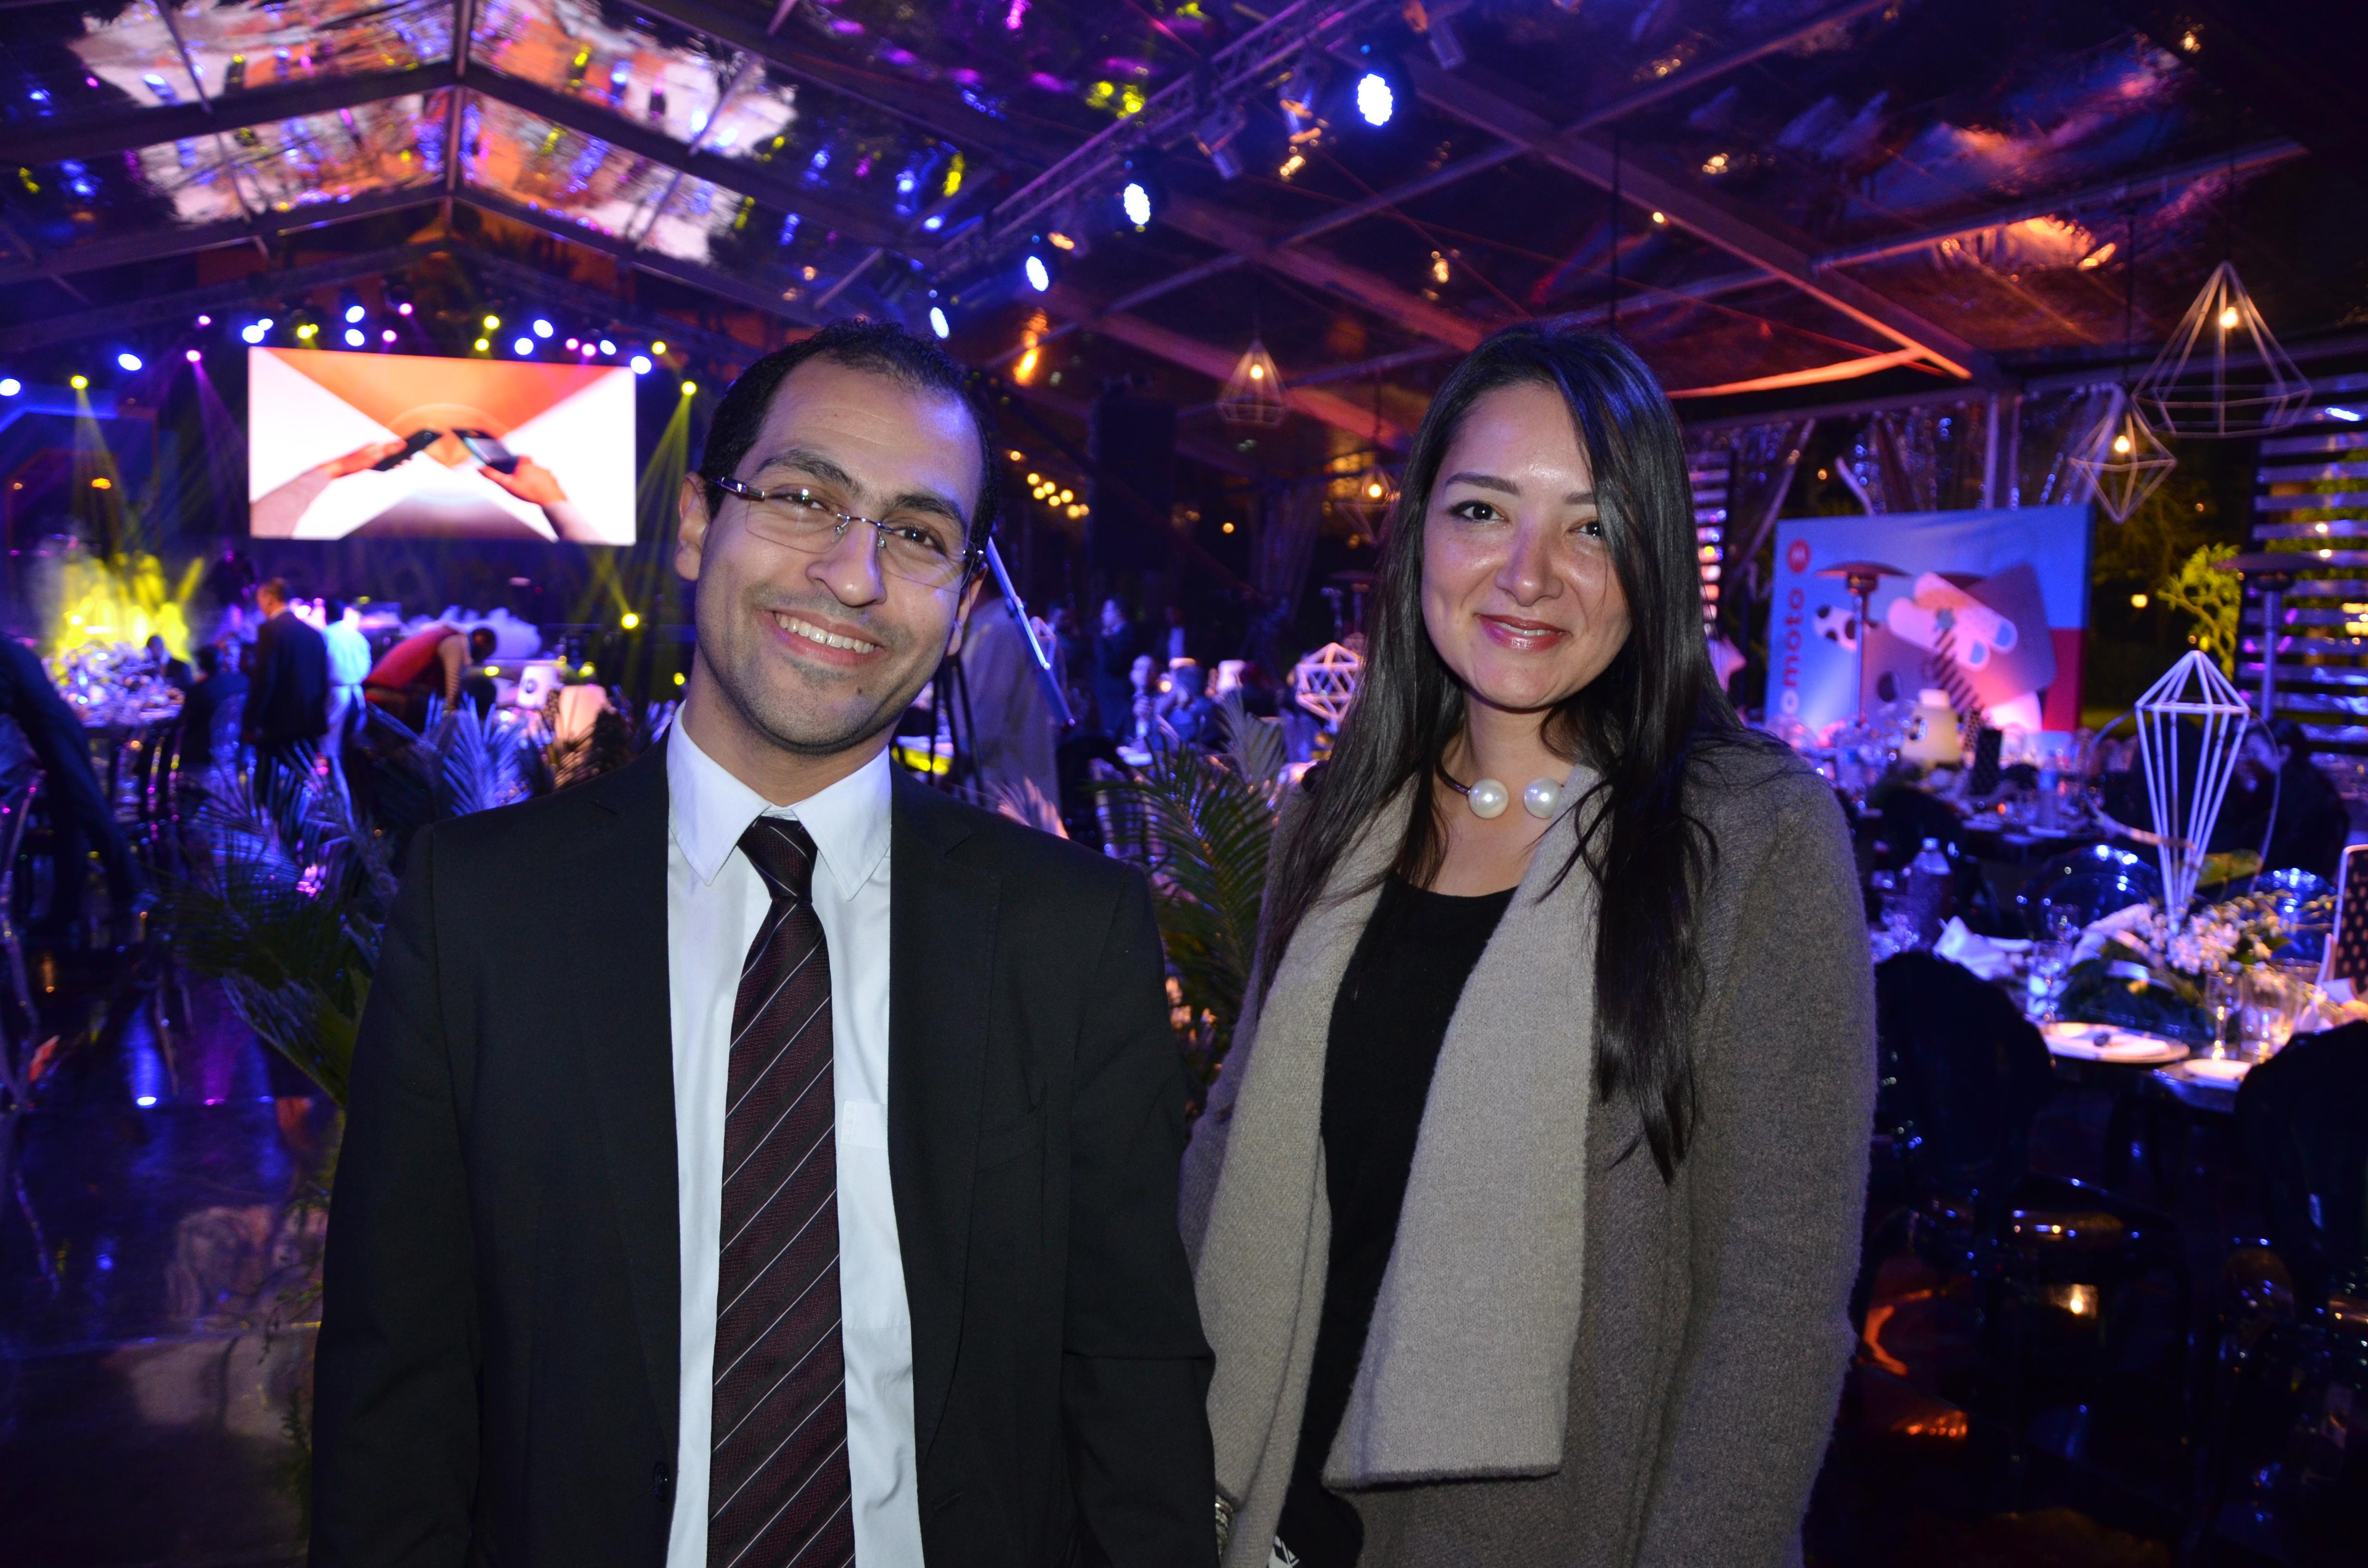 Sherif Salem & Walaa Fahmy